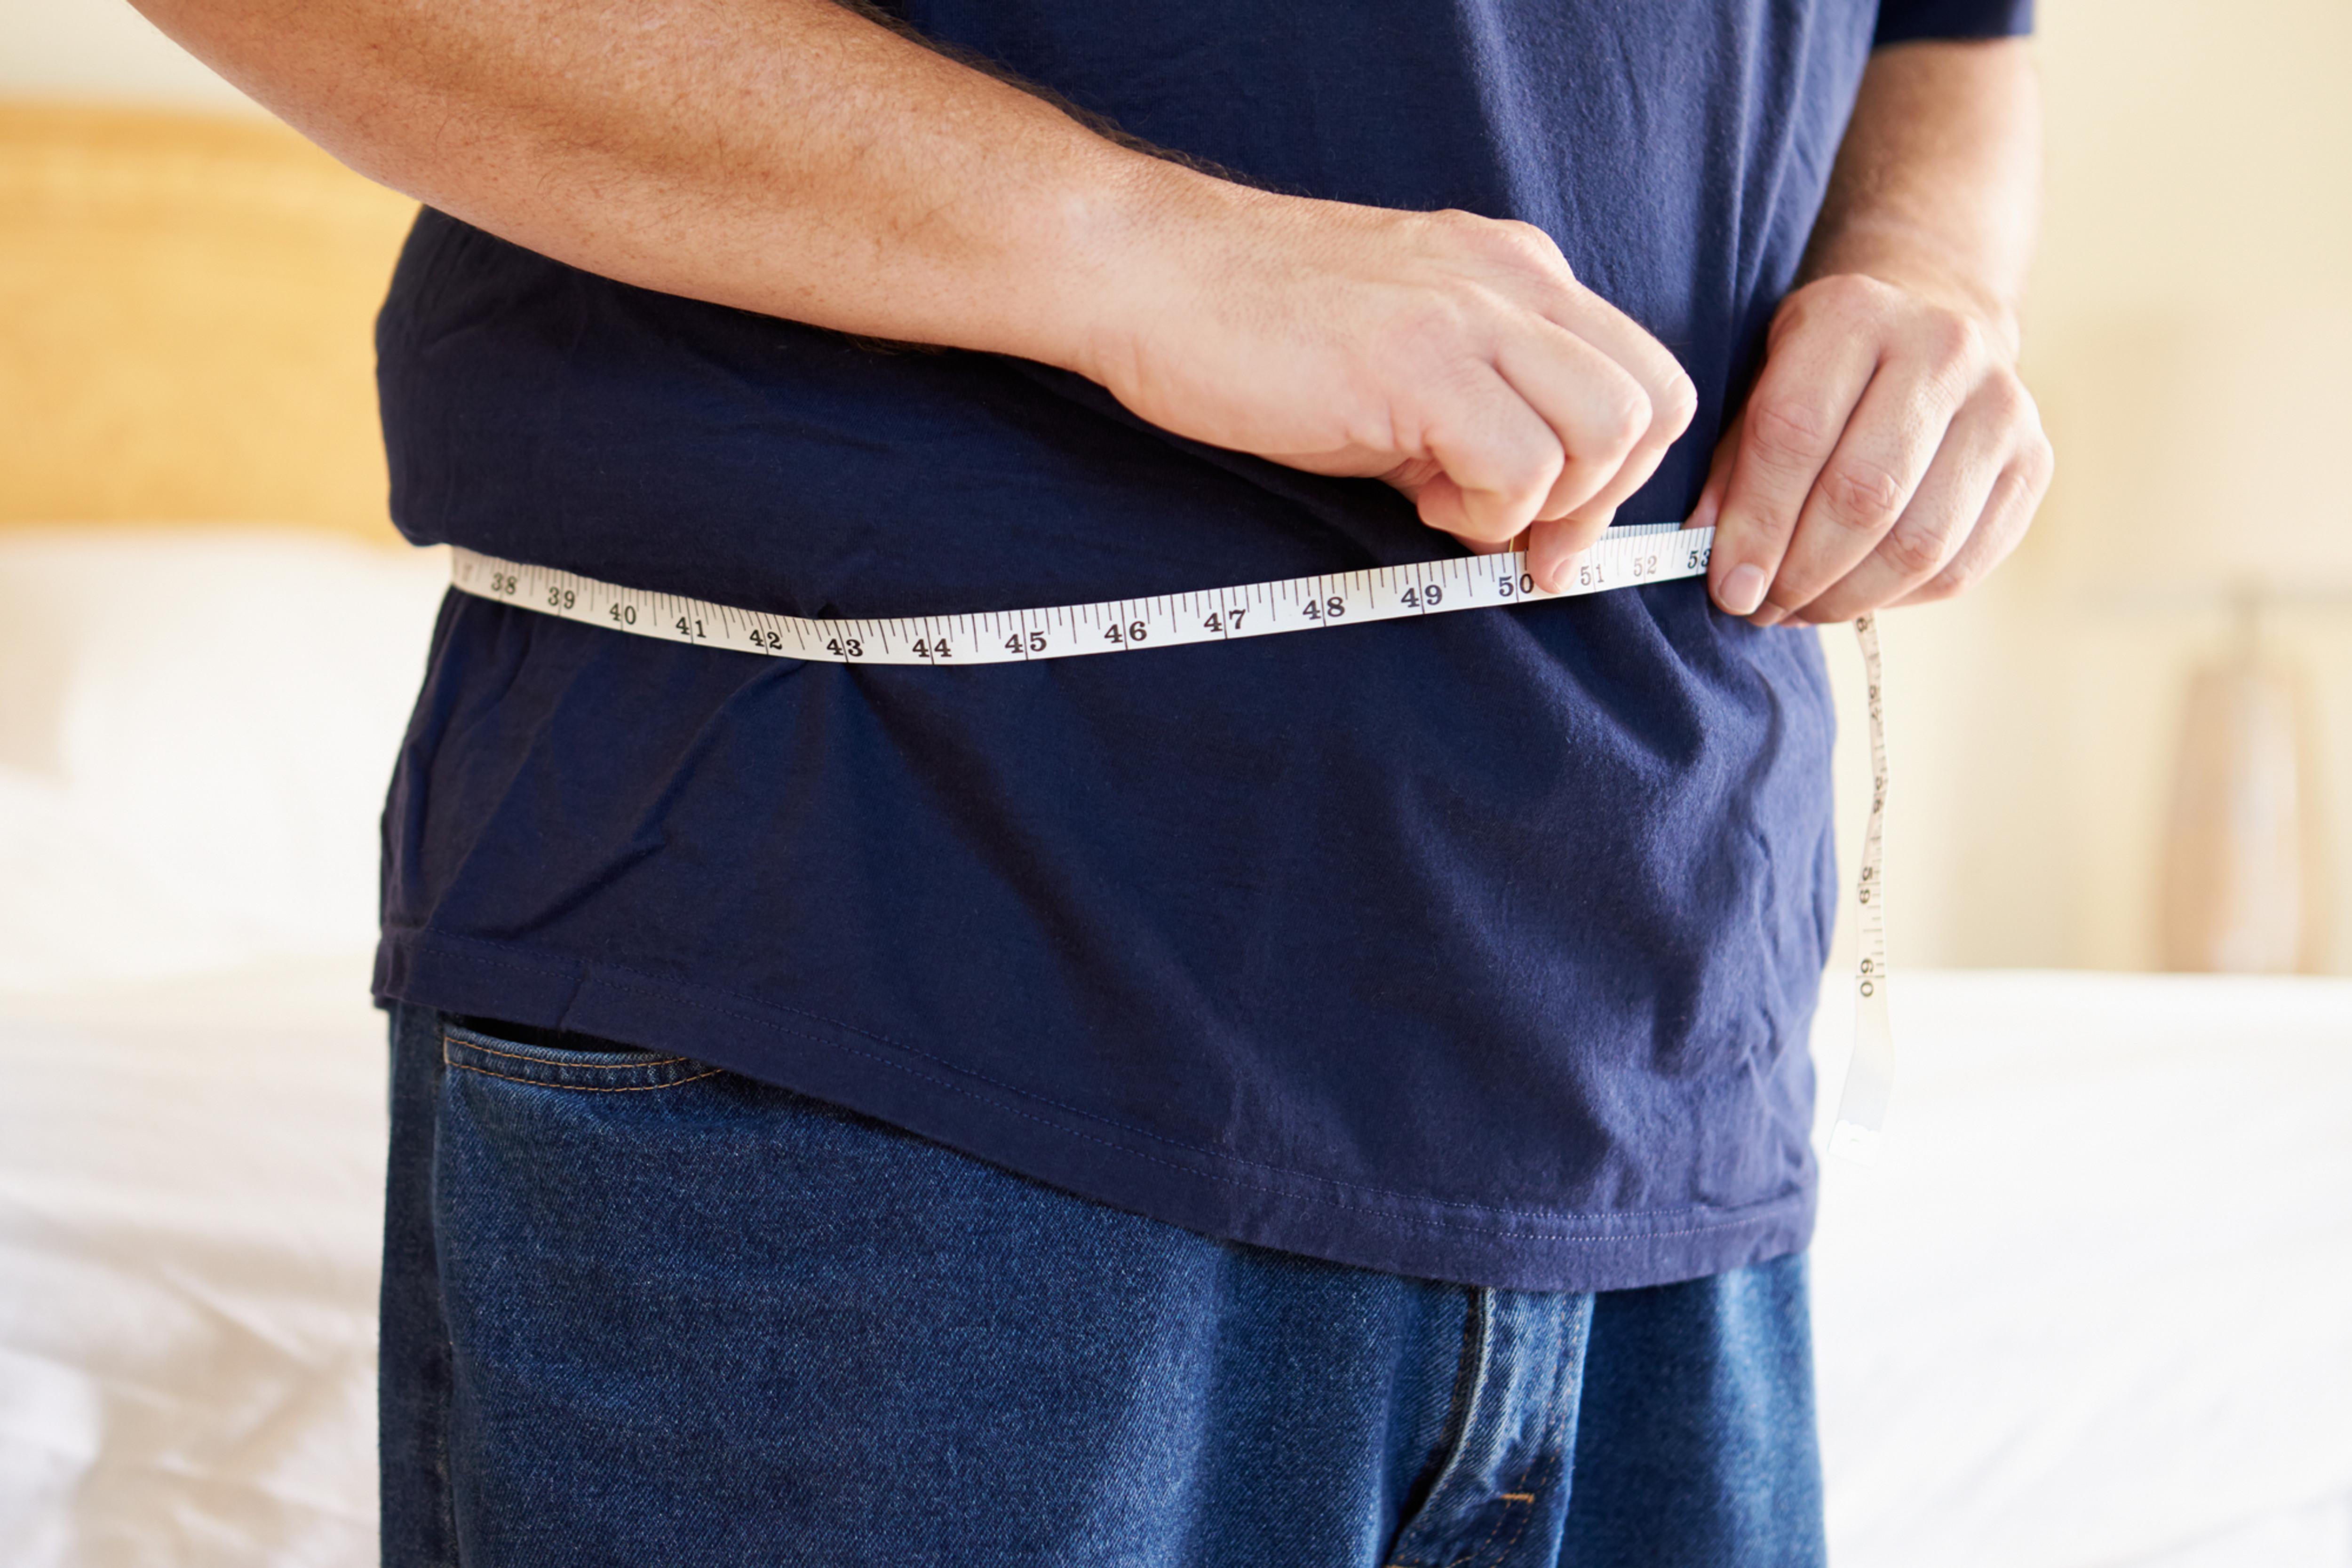 Obesity, Diabetes & Functional Fitness